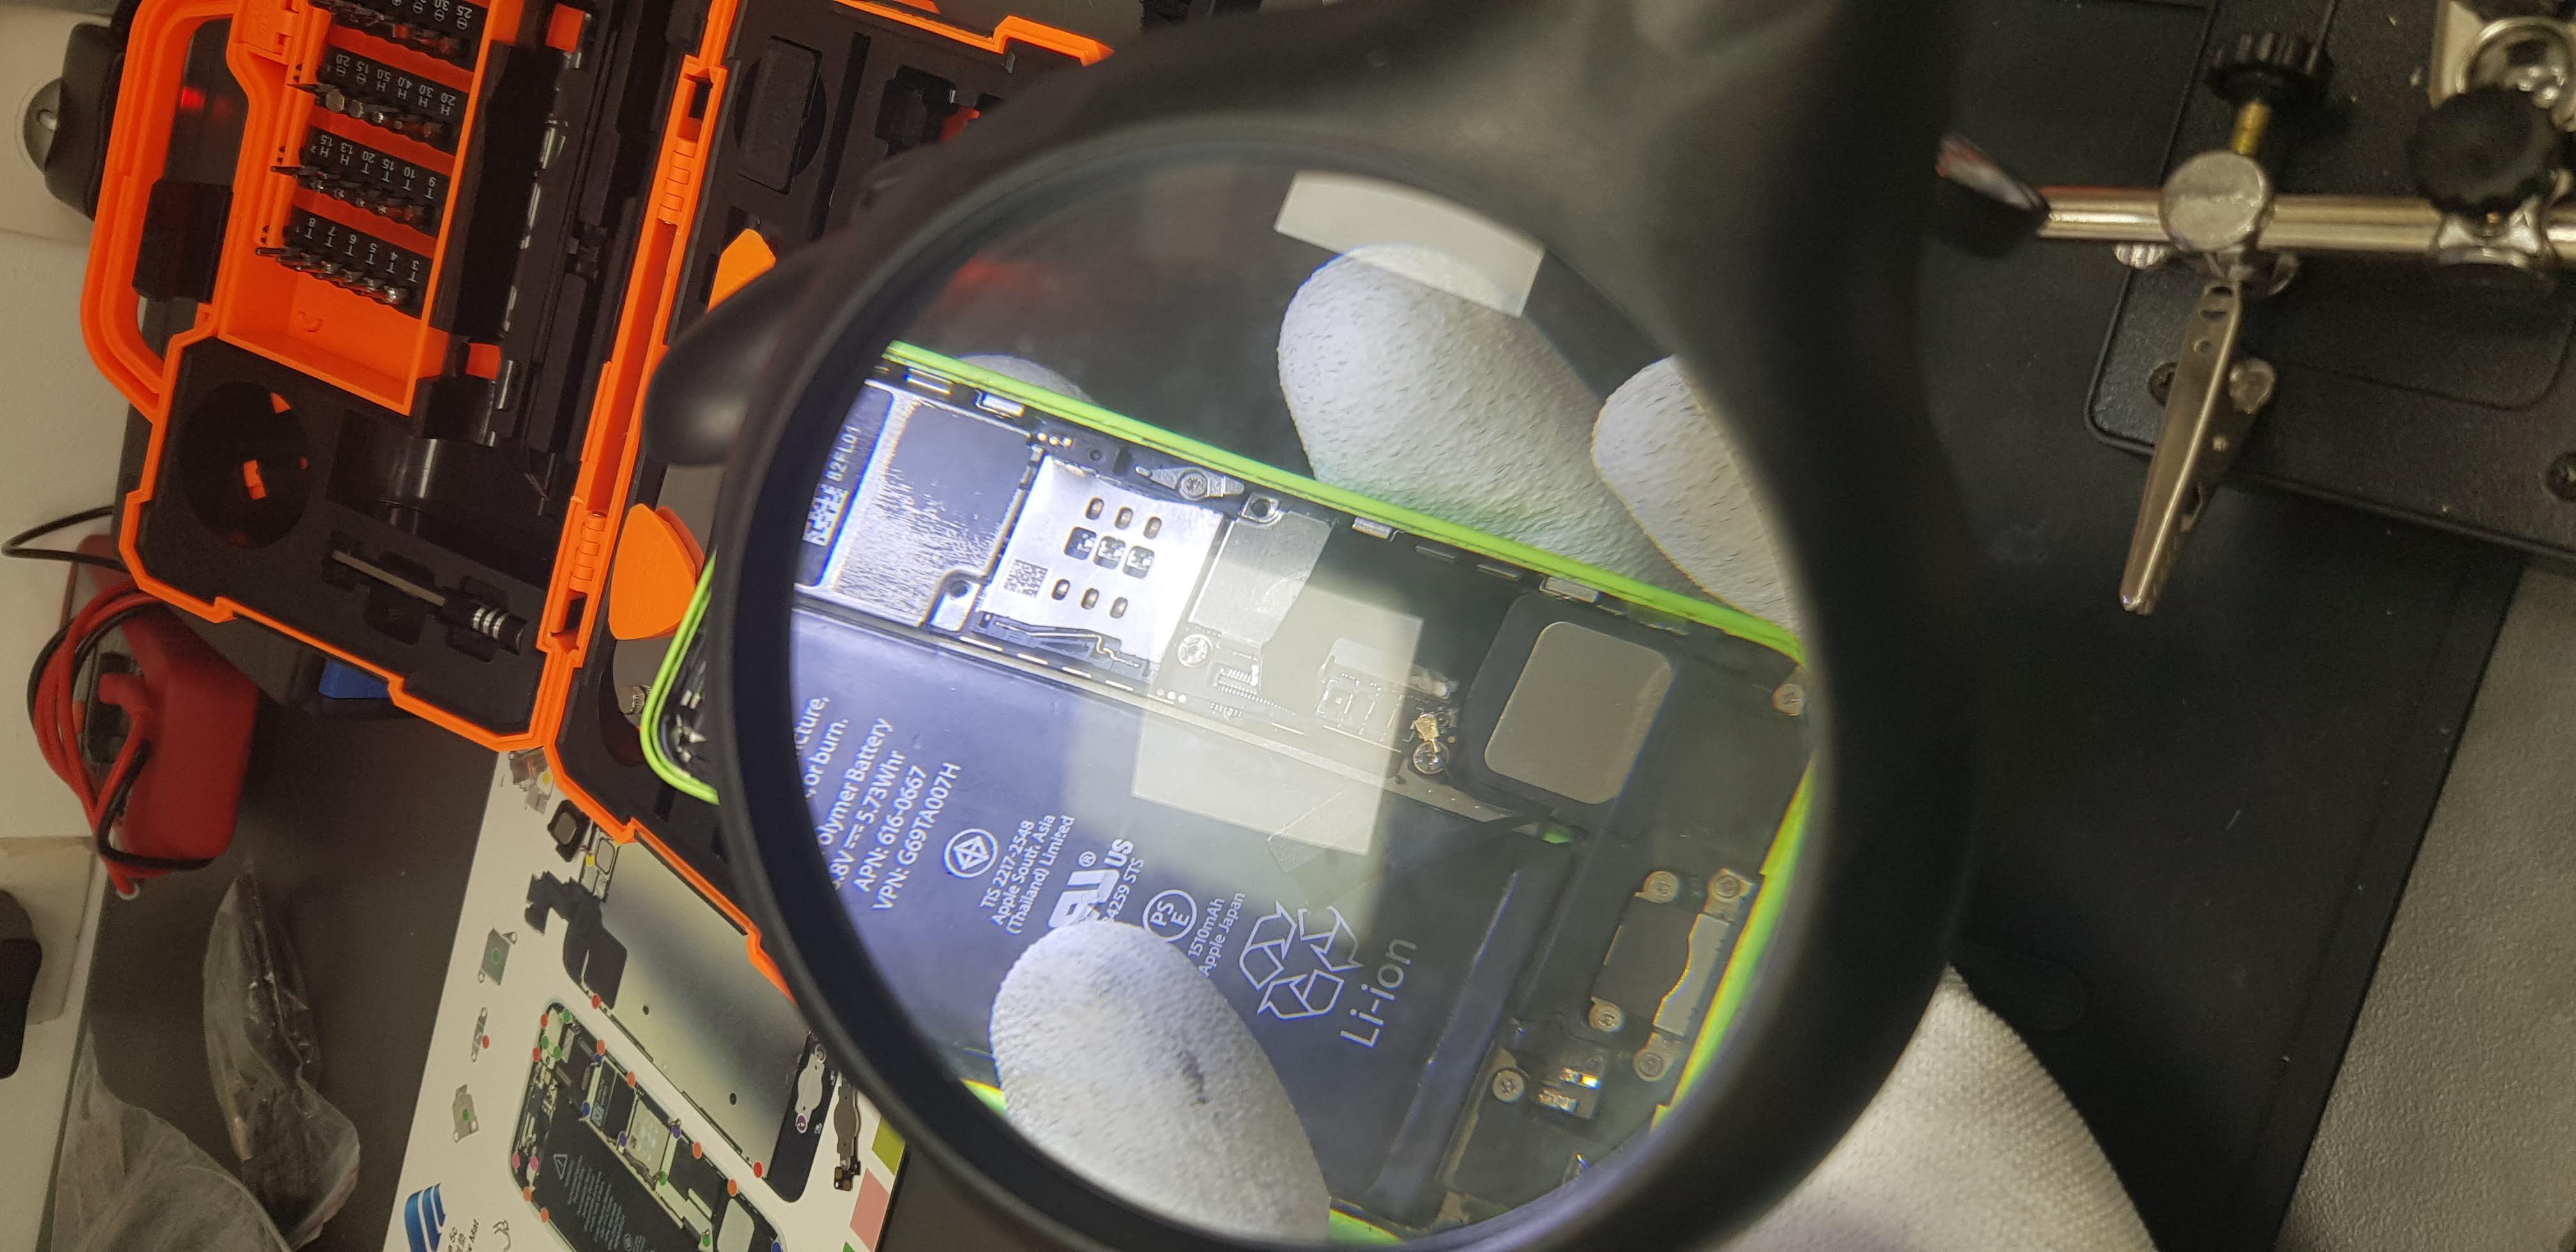 Changement batterie de smartphone à Nice